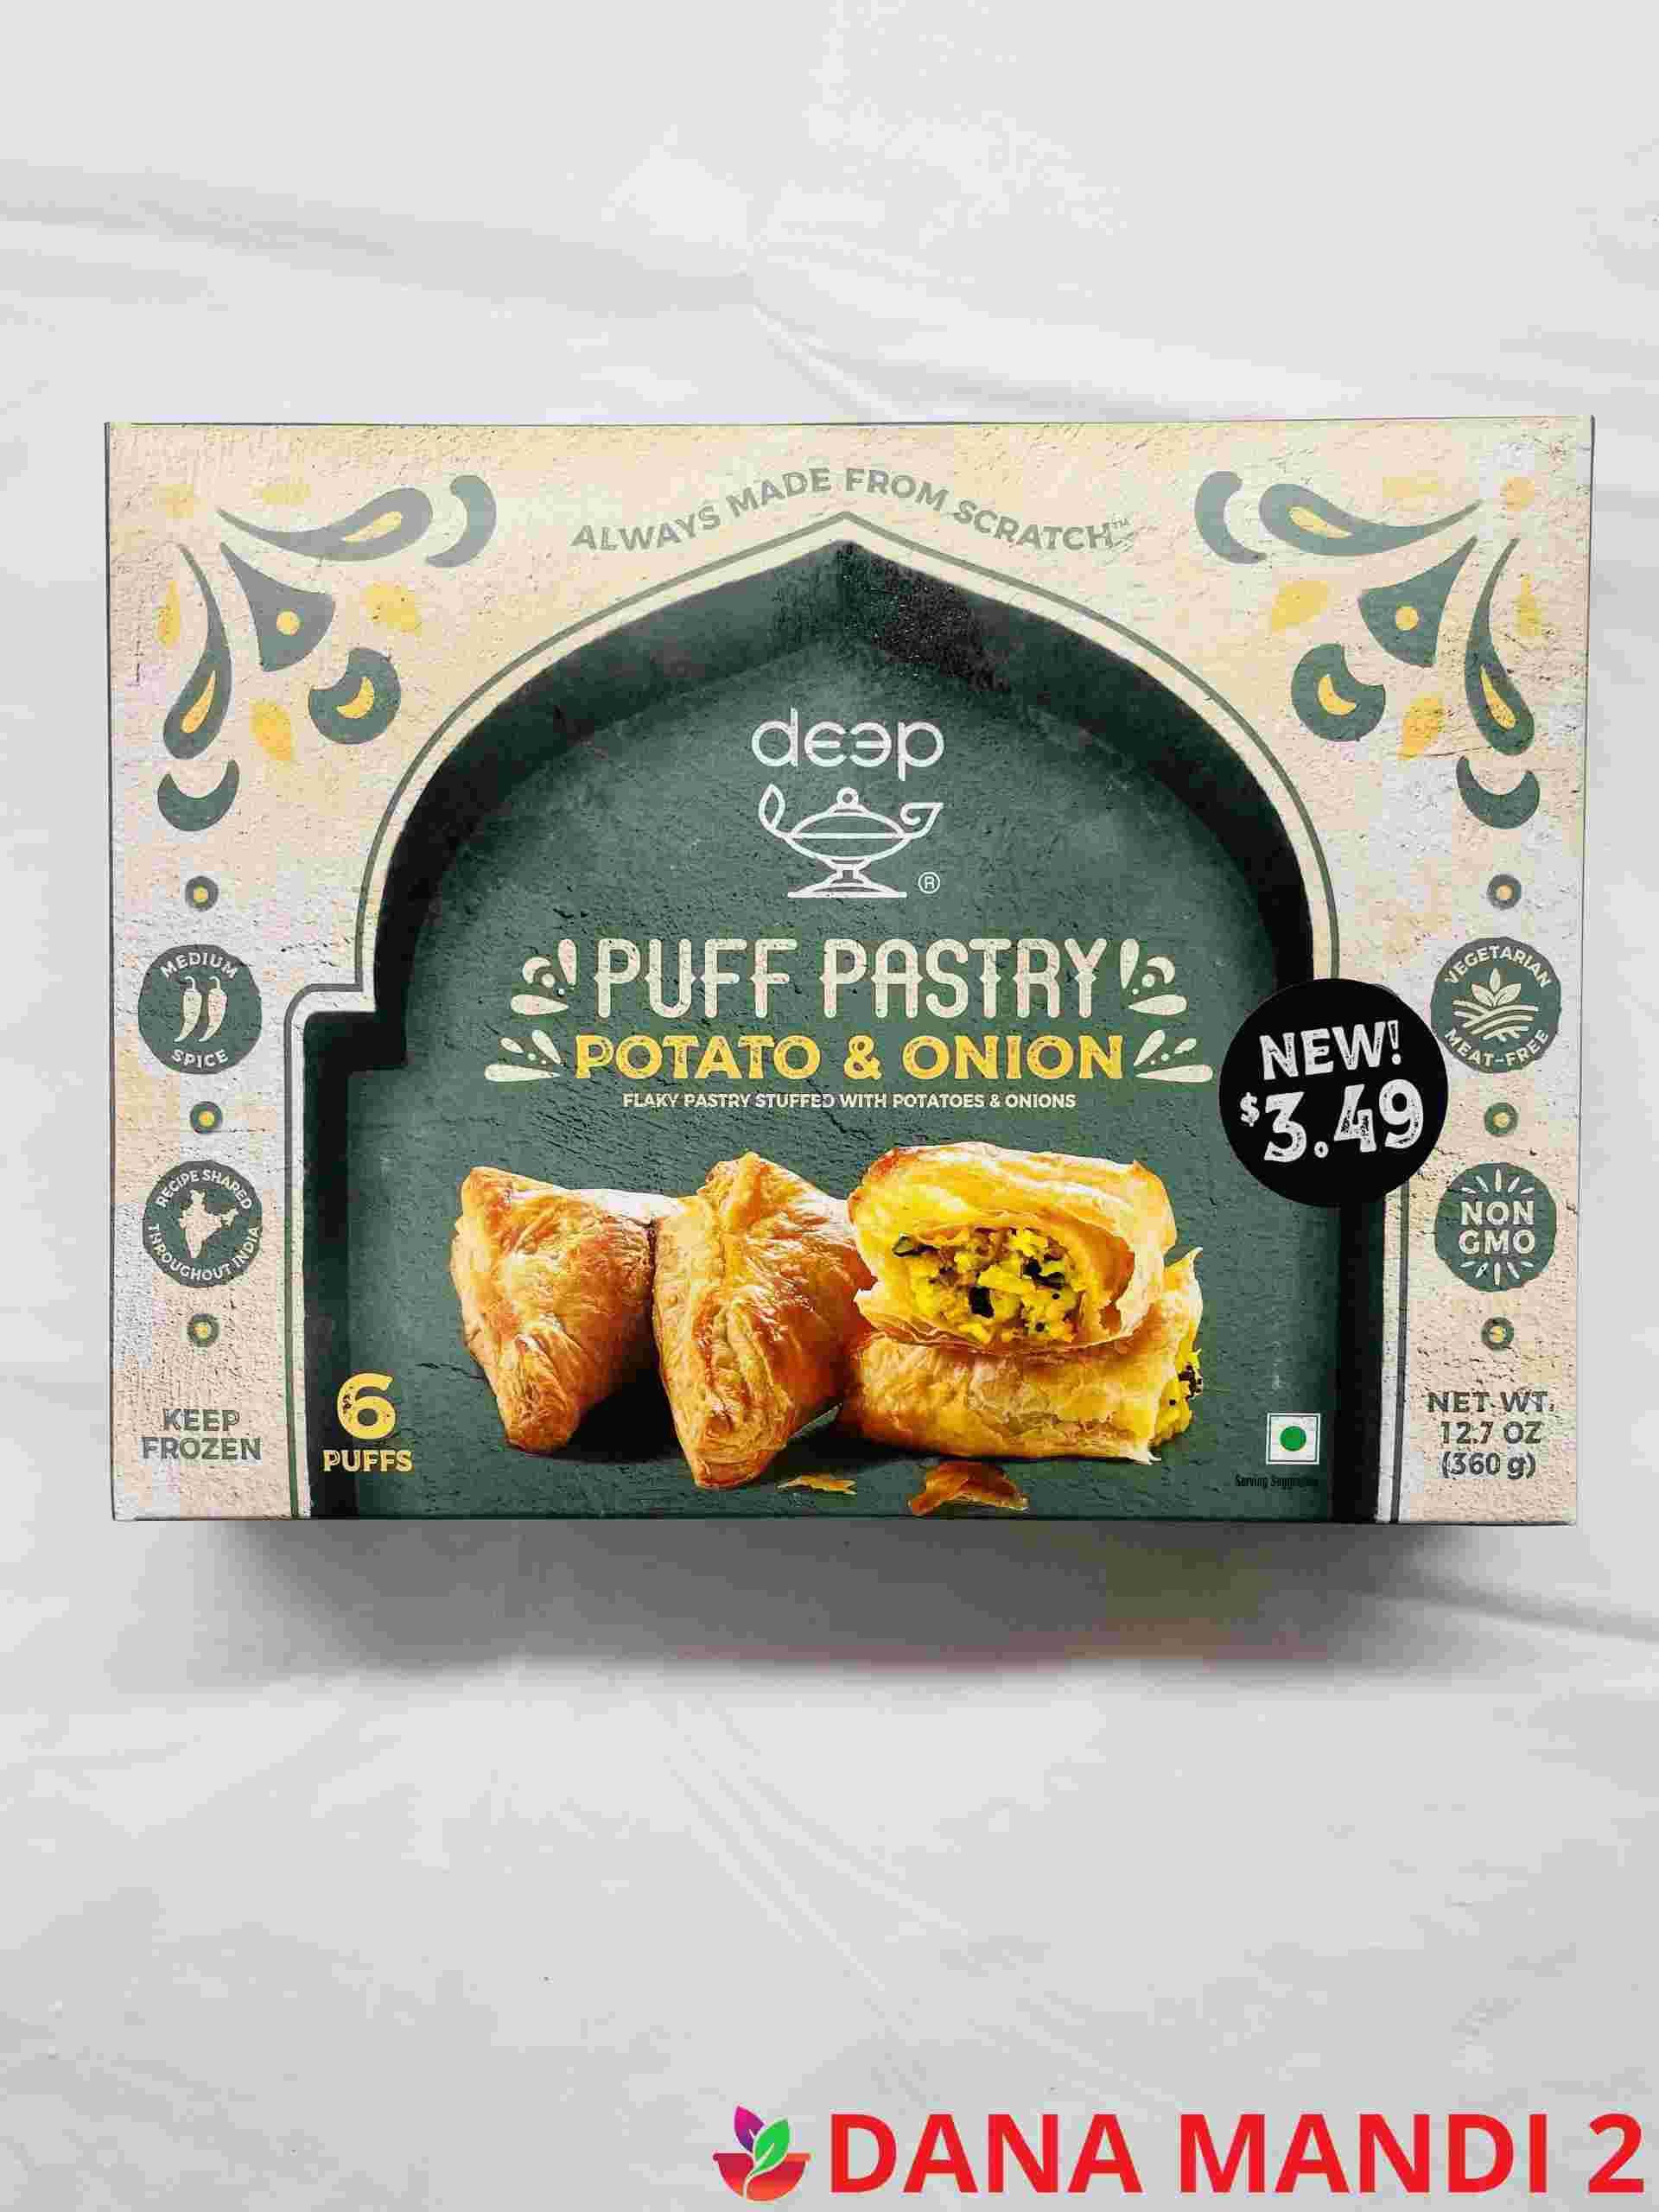 Deep  Puff Pastry Potato & Onion  6 Puffs